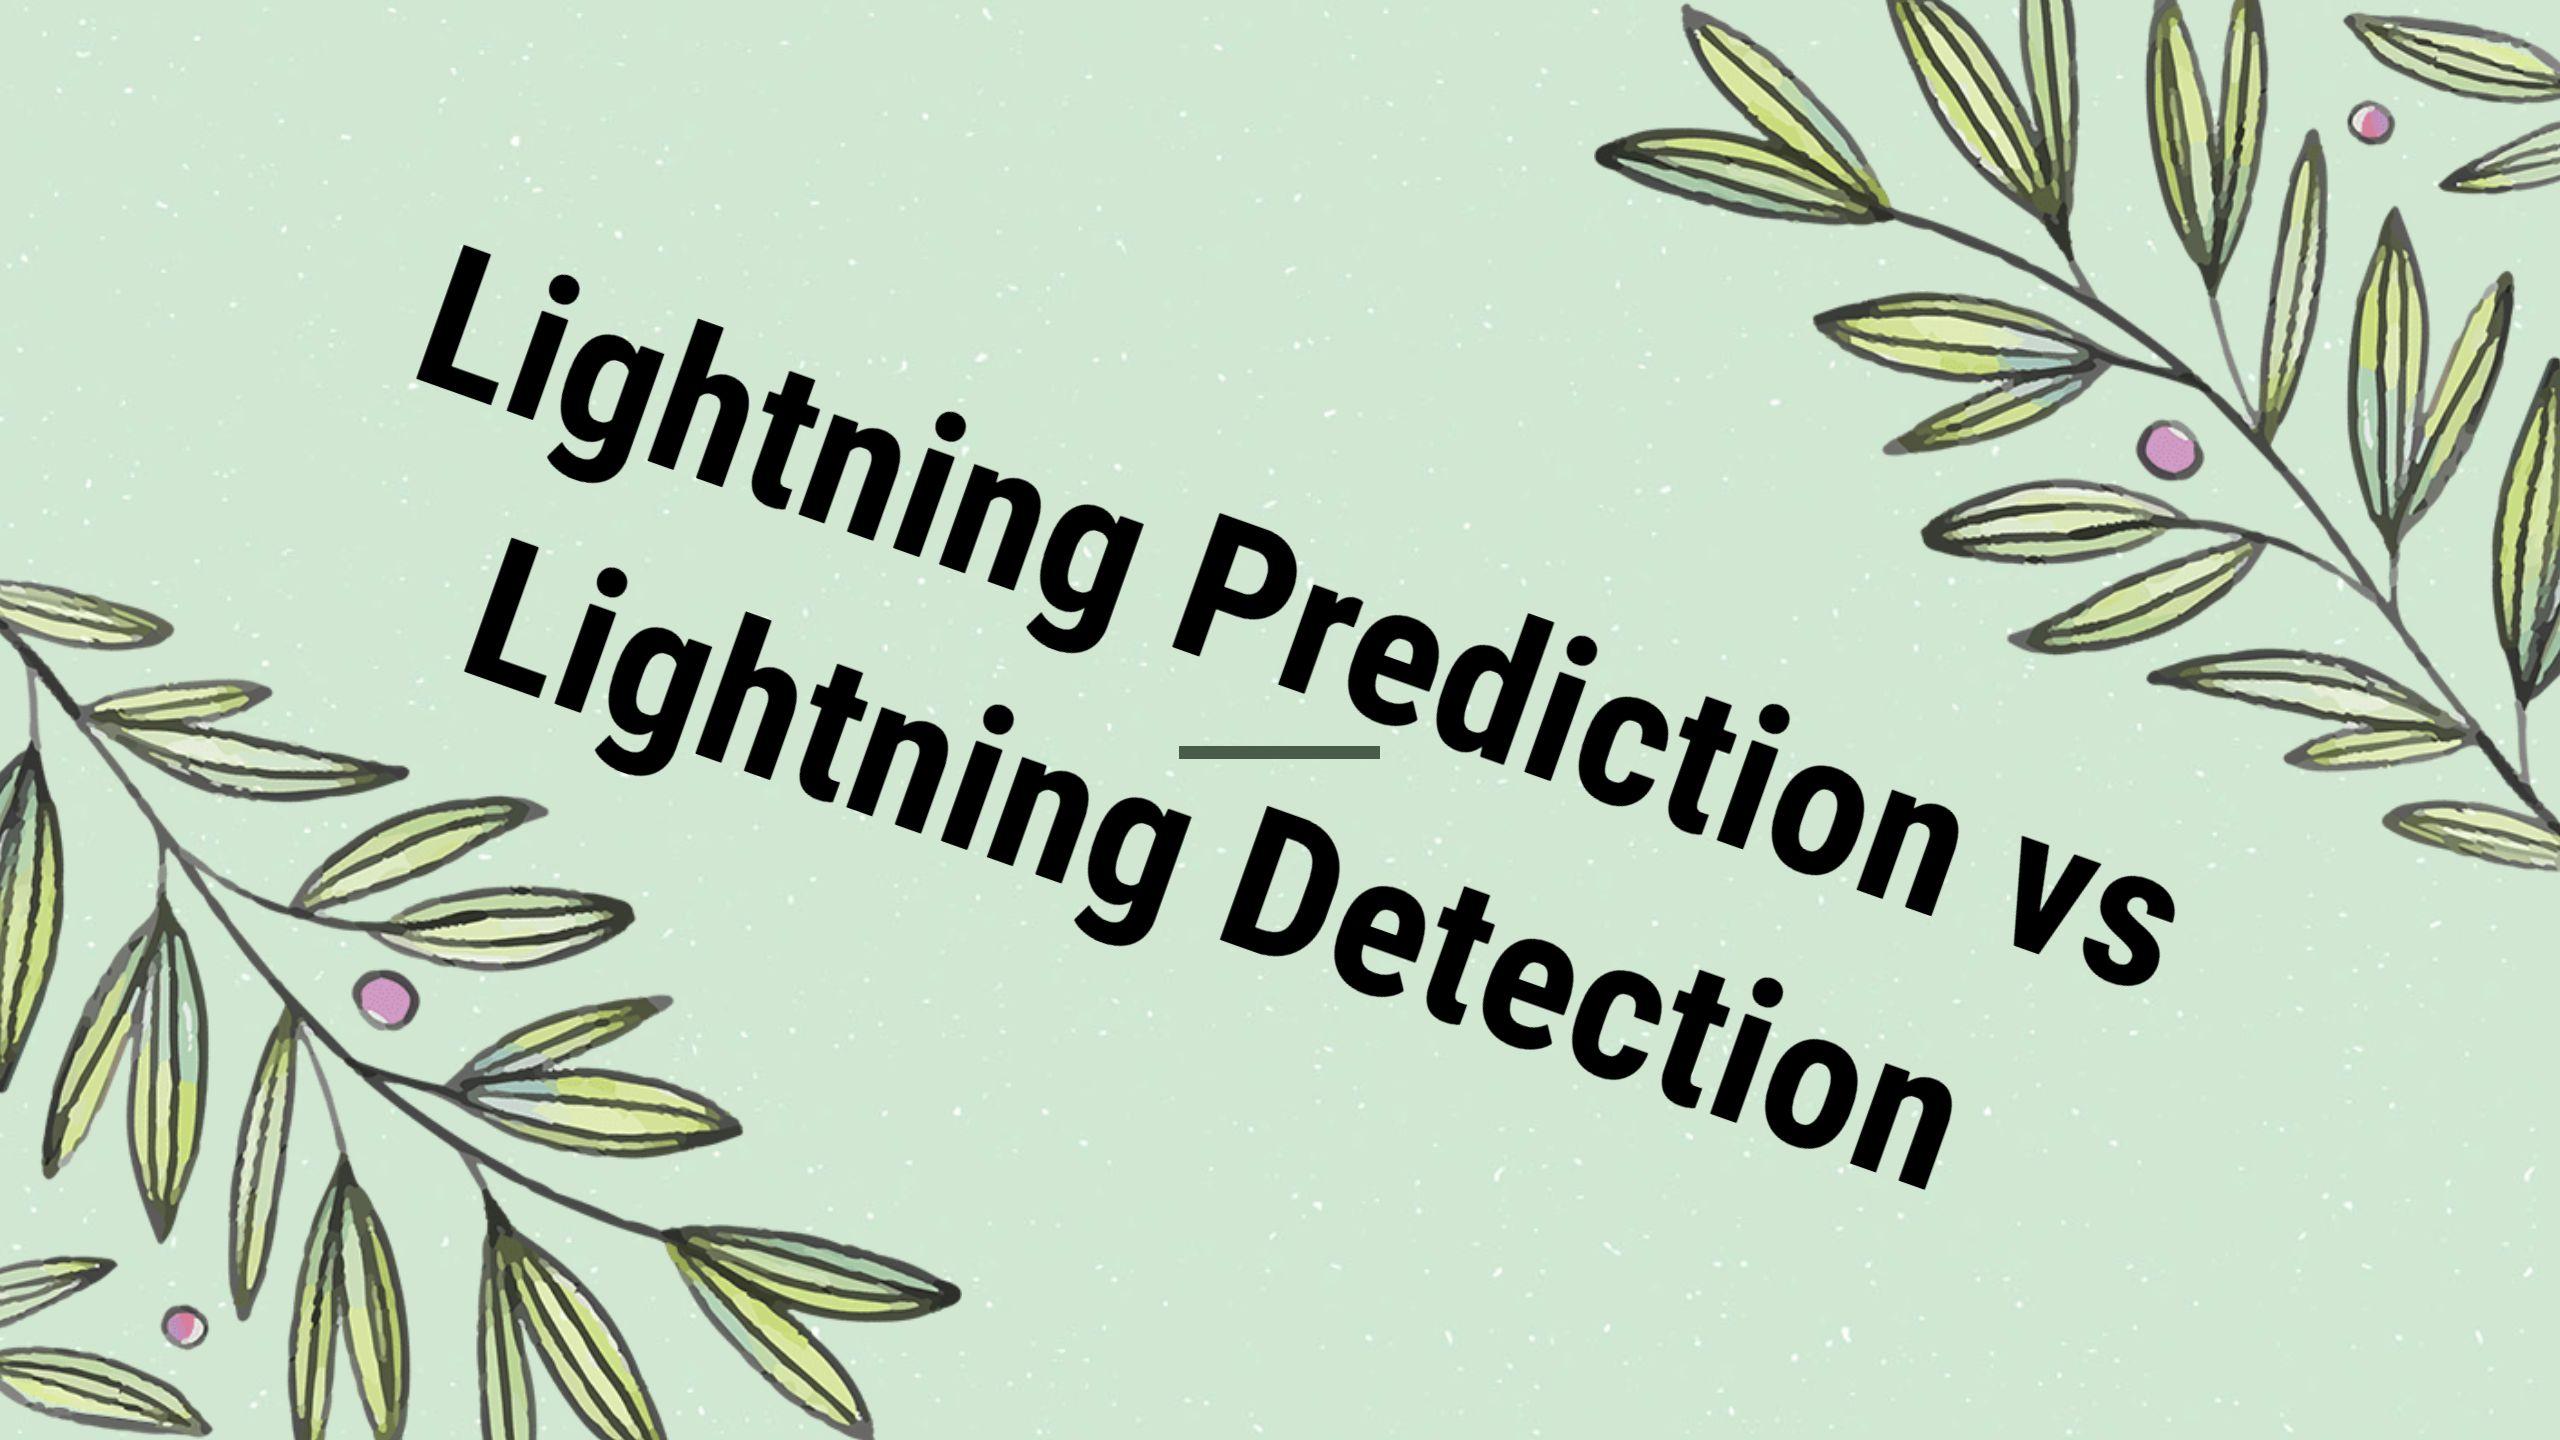 Lightning Prediction vs Lightning Detection image